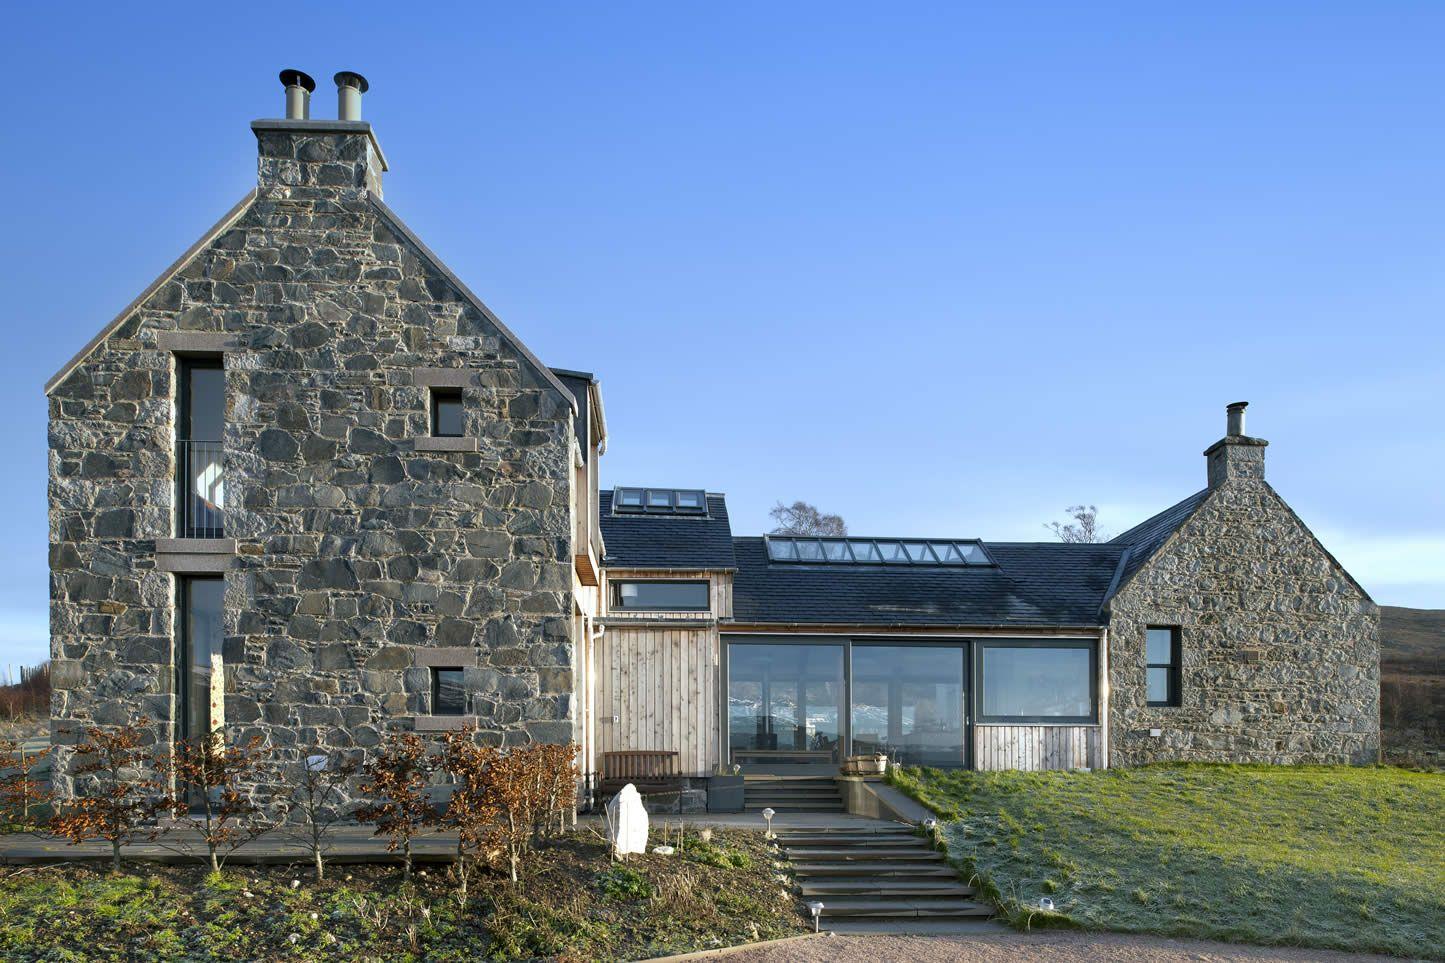 Modern Stone Cottage stone house designedpeter legge associates ; connemara